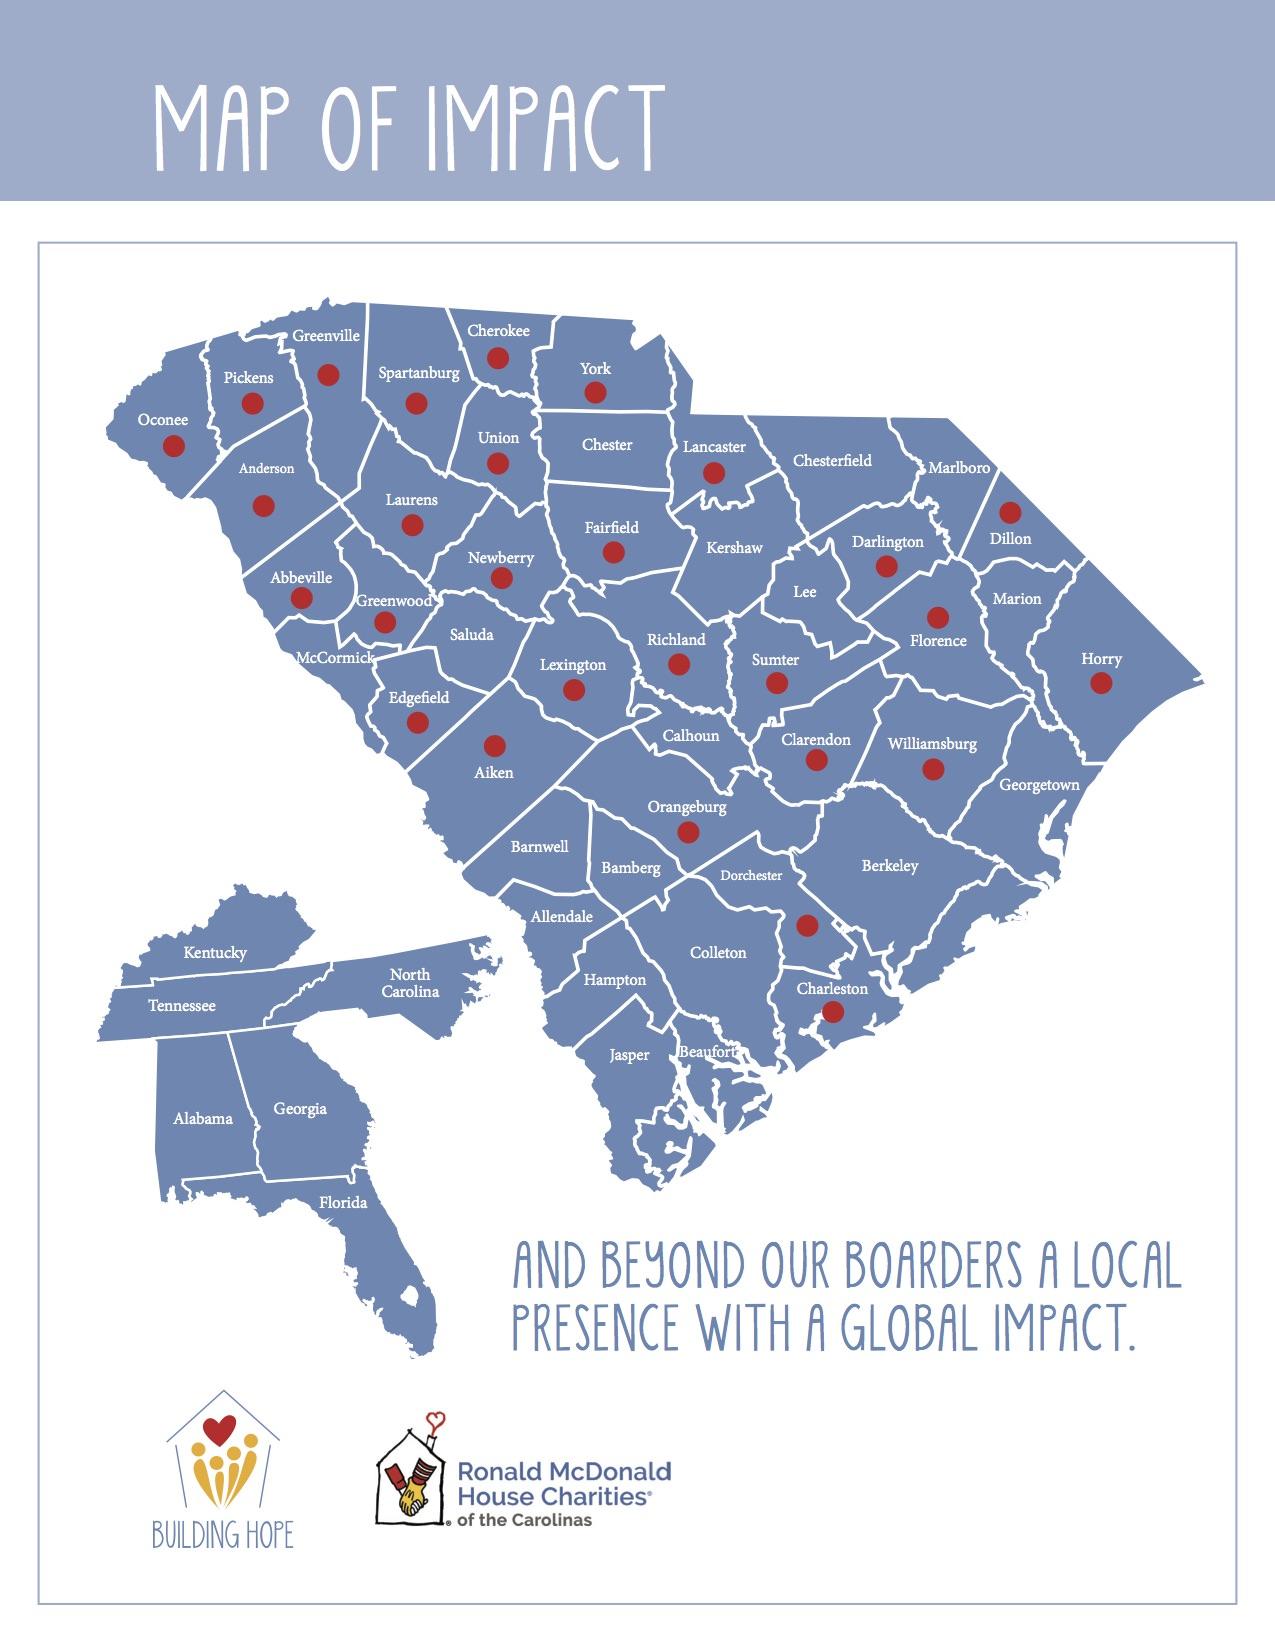 RMH-1010-Capital Campaign Impact MapRMH-1010-Capital Campaign Impact Map...